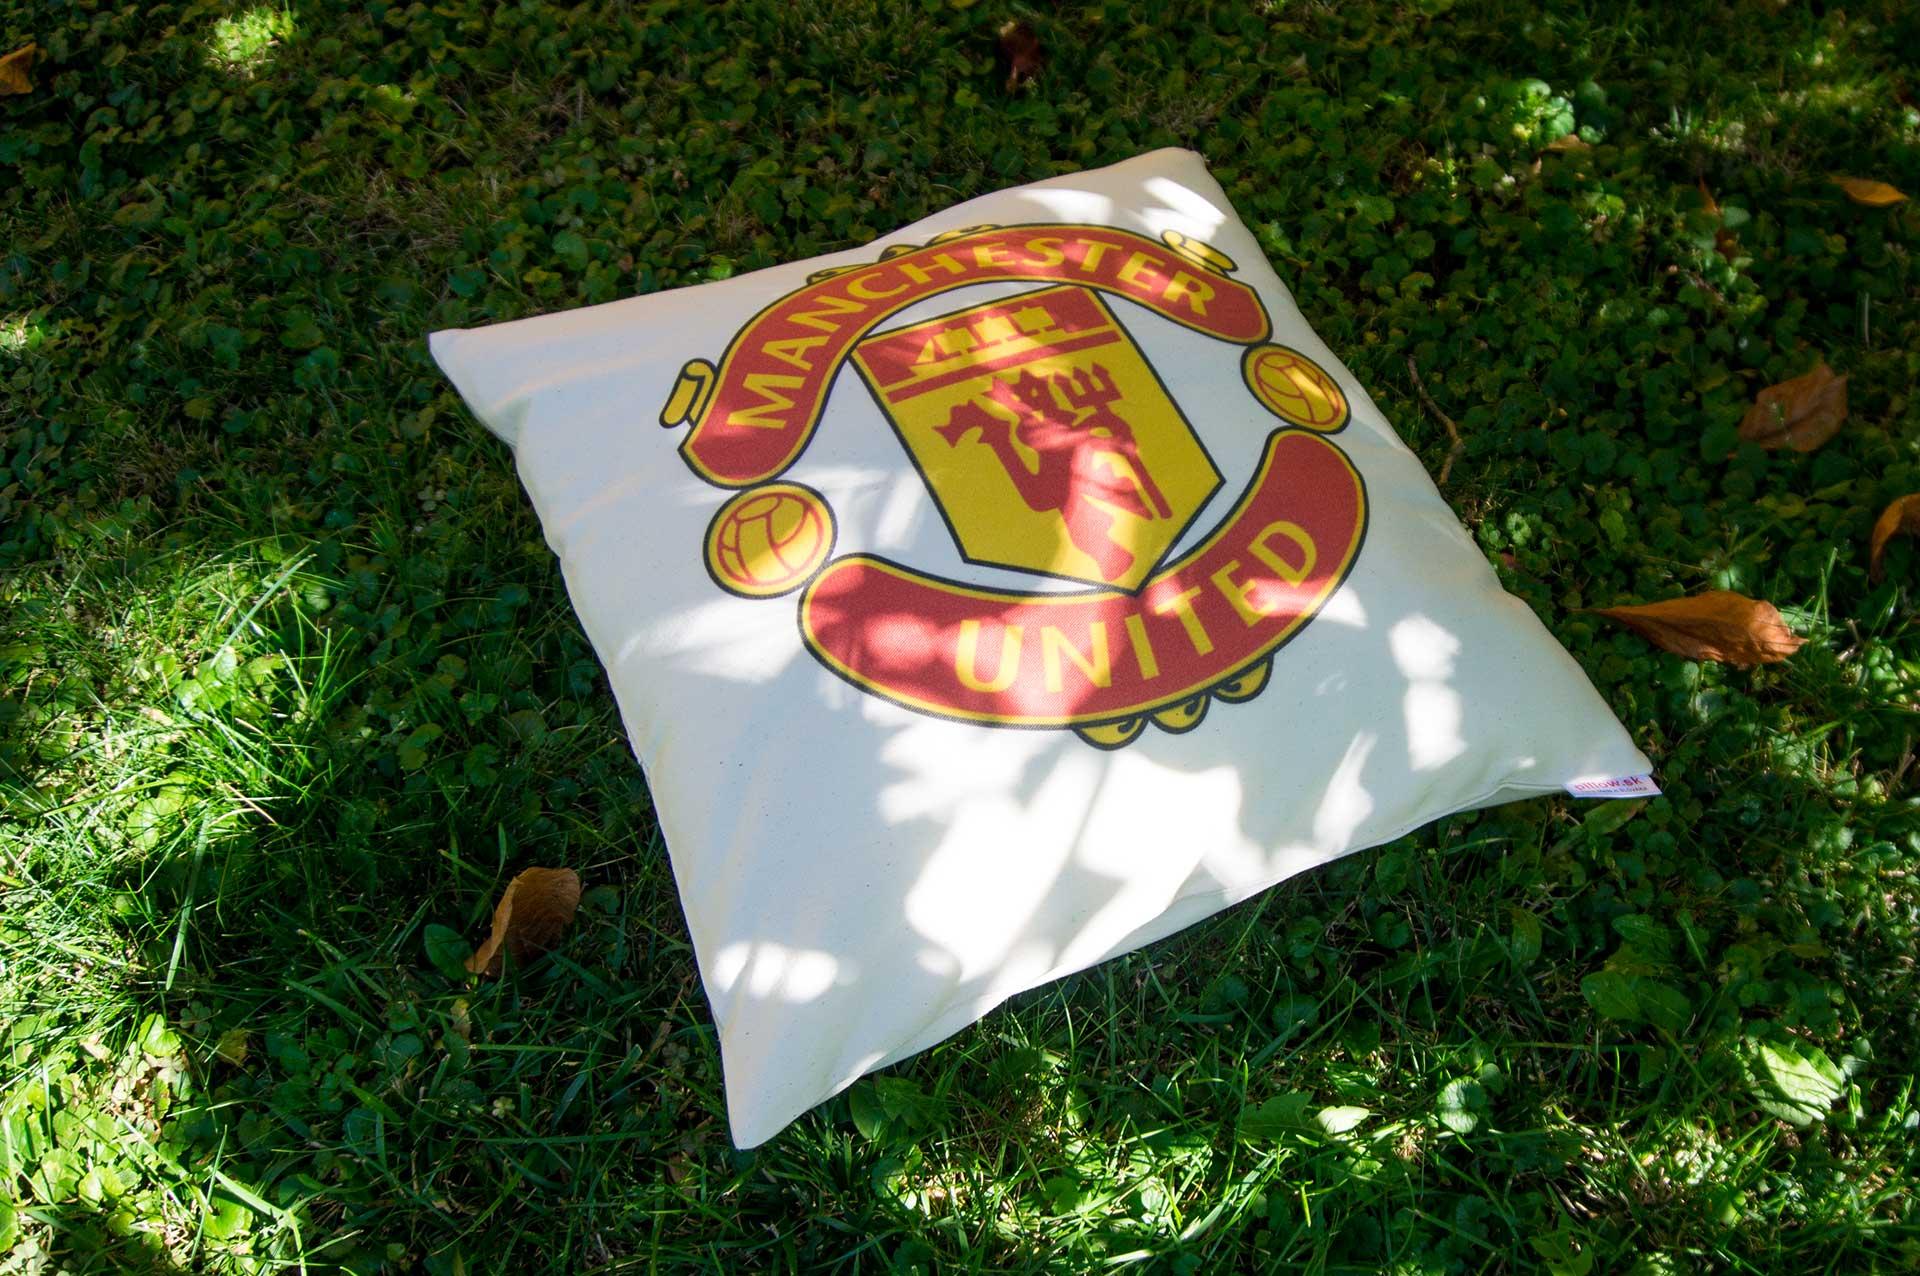 Vankúš s logom klubu Manchester United